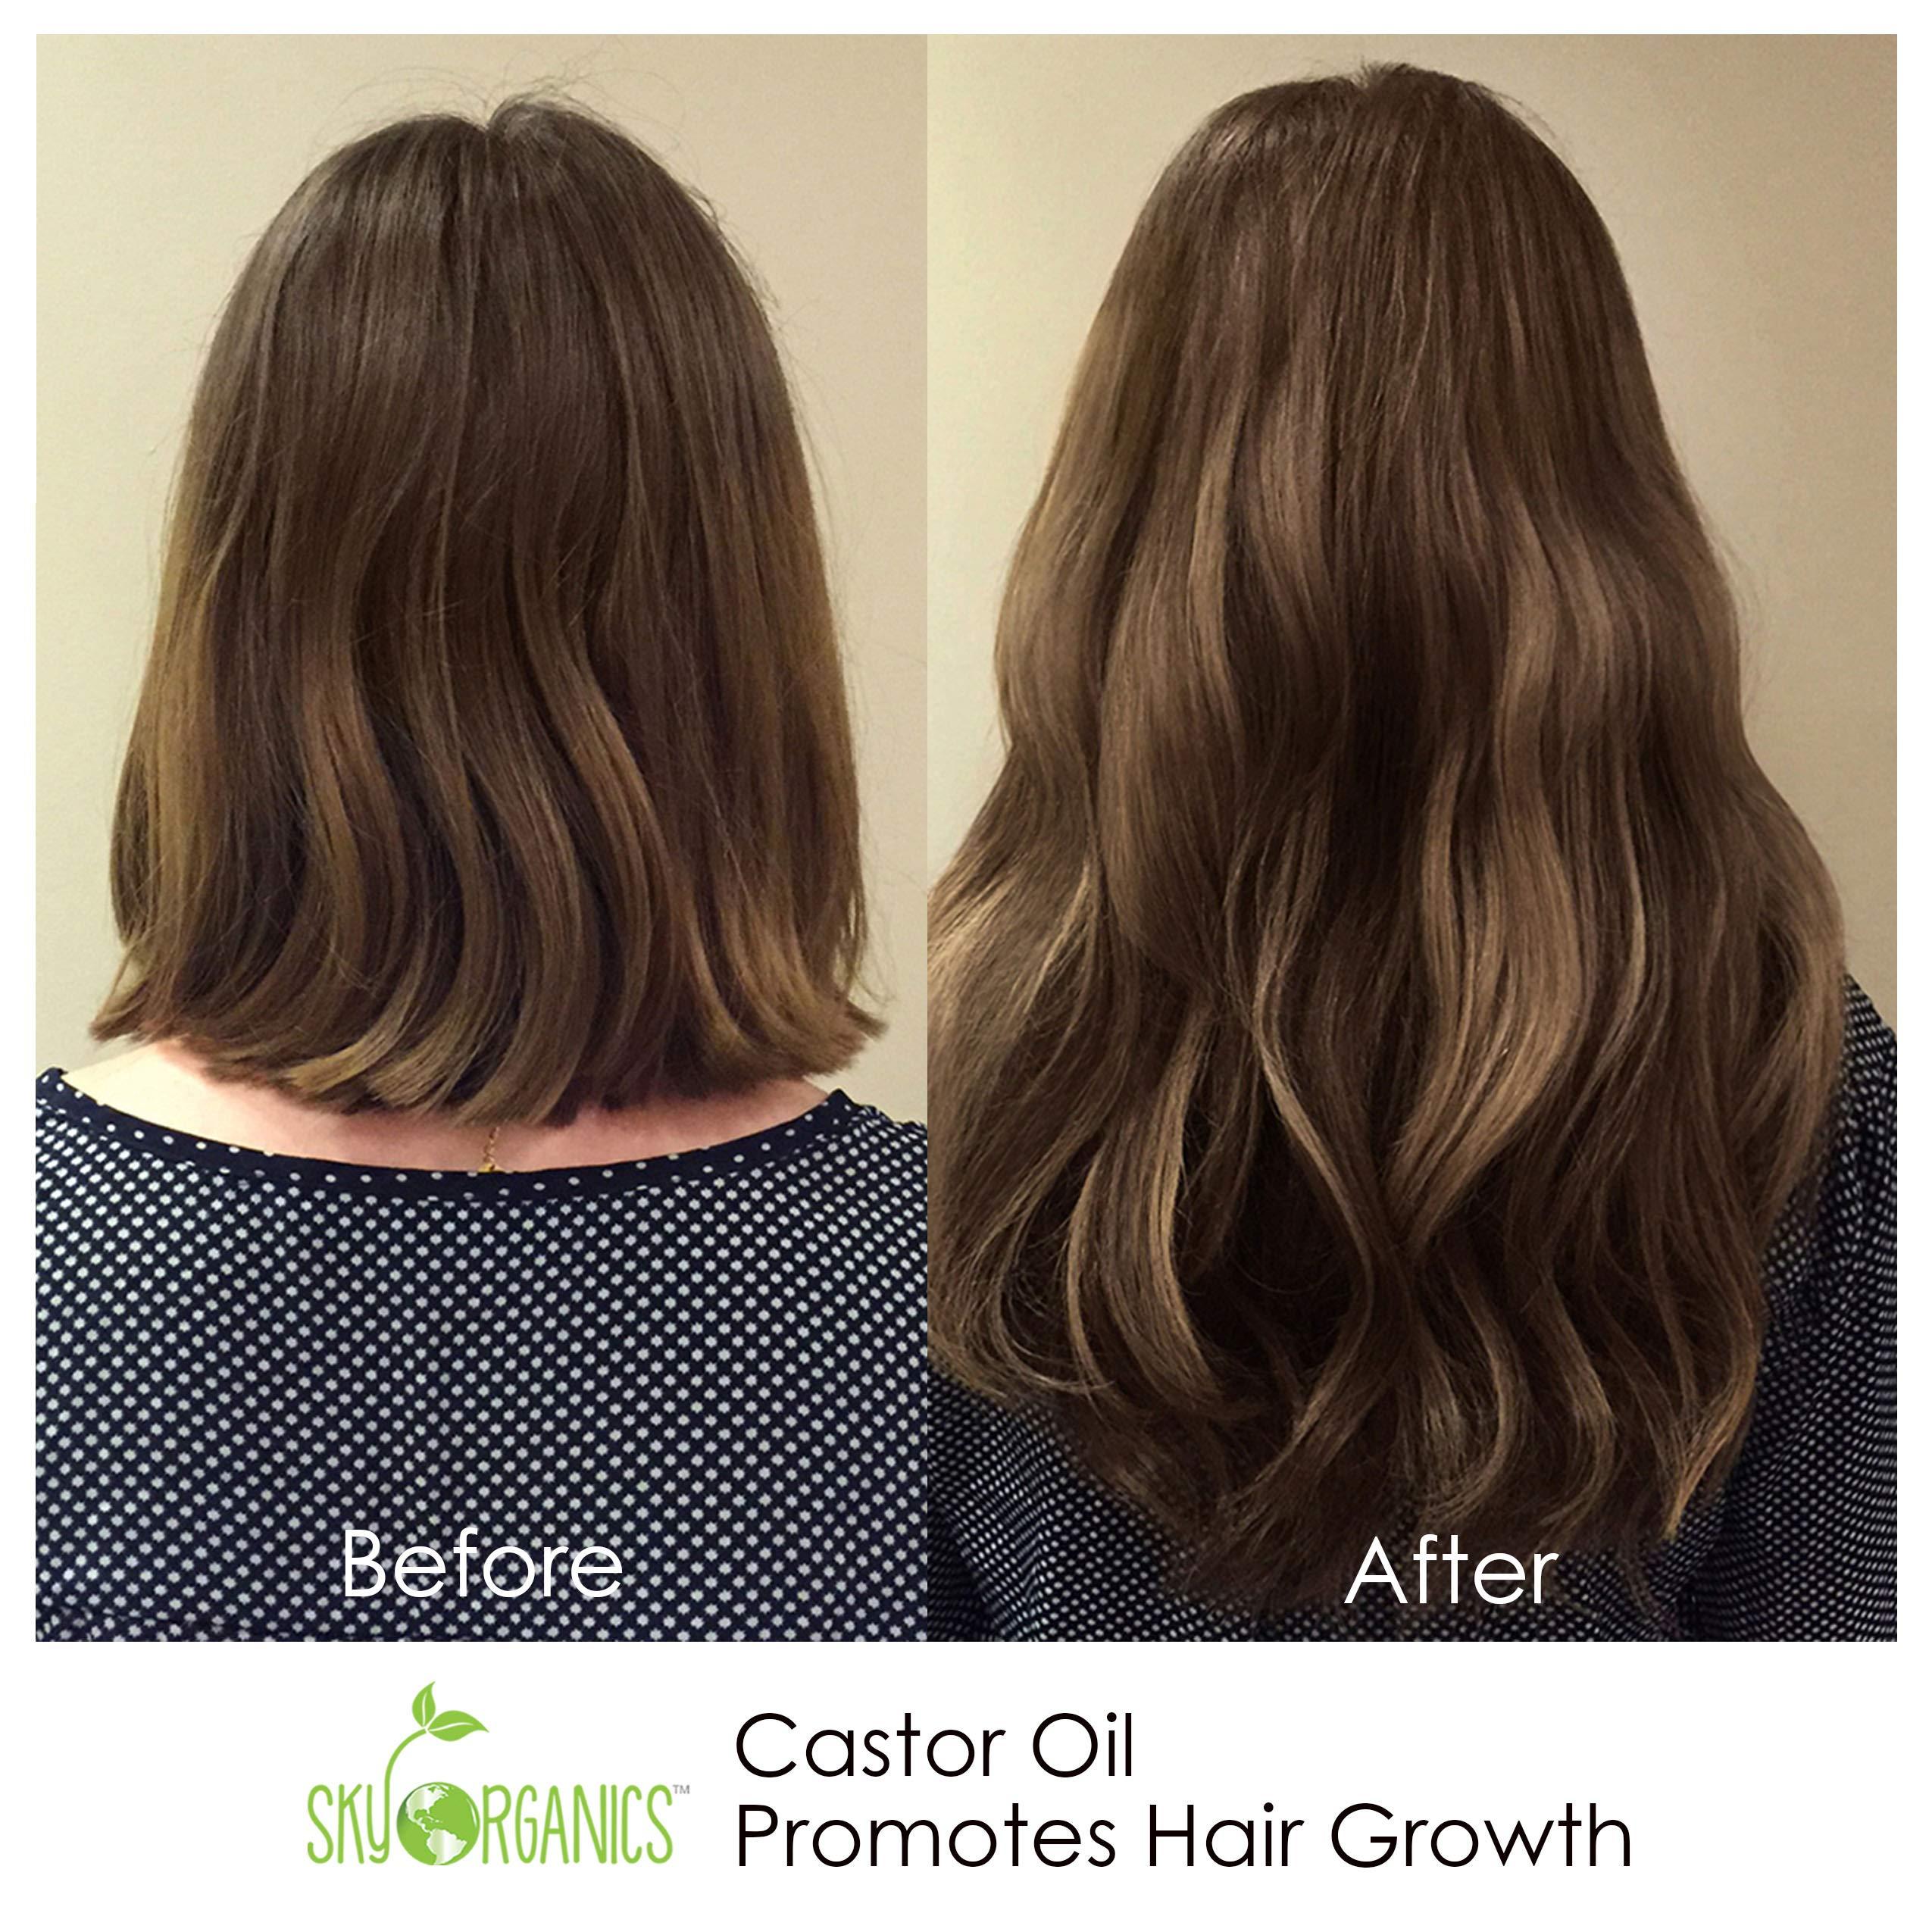 Castor Oil (16oz) USDA Organic Cold-Pressed, 100% Pure, Hexane-Free Castor Oil - Moisturizing & Healing, For Dry Skin, Hair Growth - For Skin, Hair Care, Eyelashes - Caster Oil By Sky Organics by Sky Organics (Image #5)